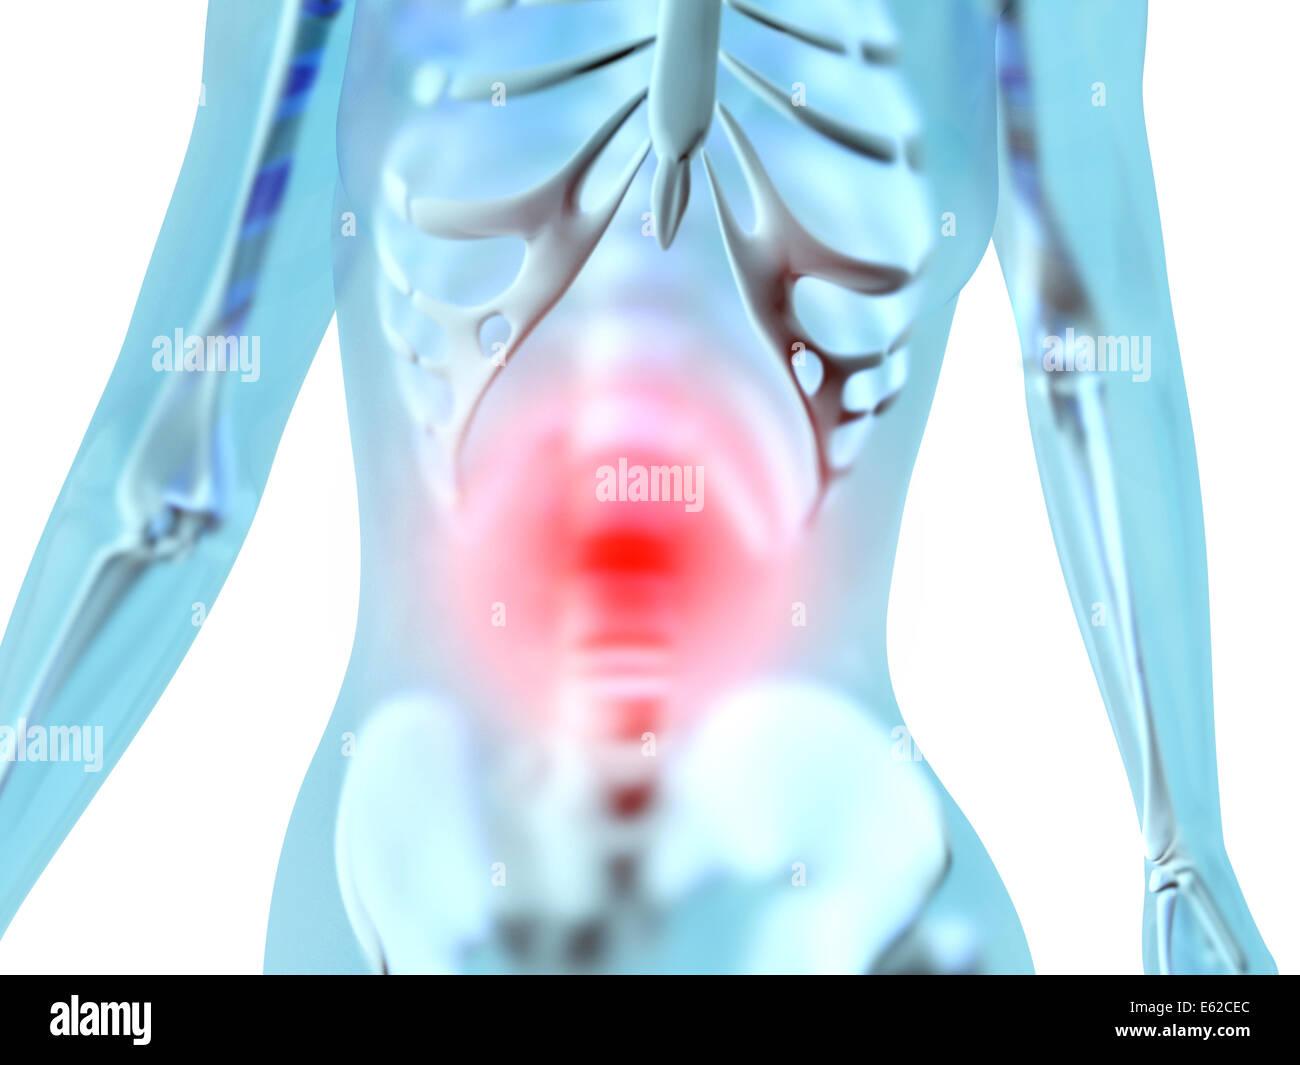 Female anatomy stomach ache and pain sensation stock photo female anatomy stomach ache and pain sensation ccuart Gallery